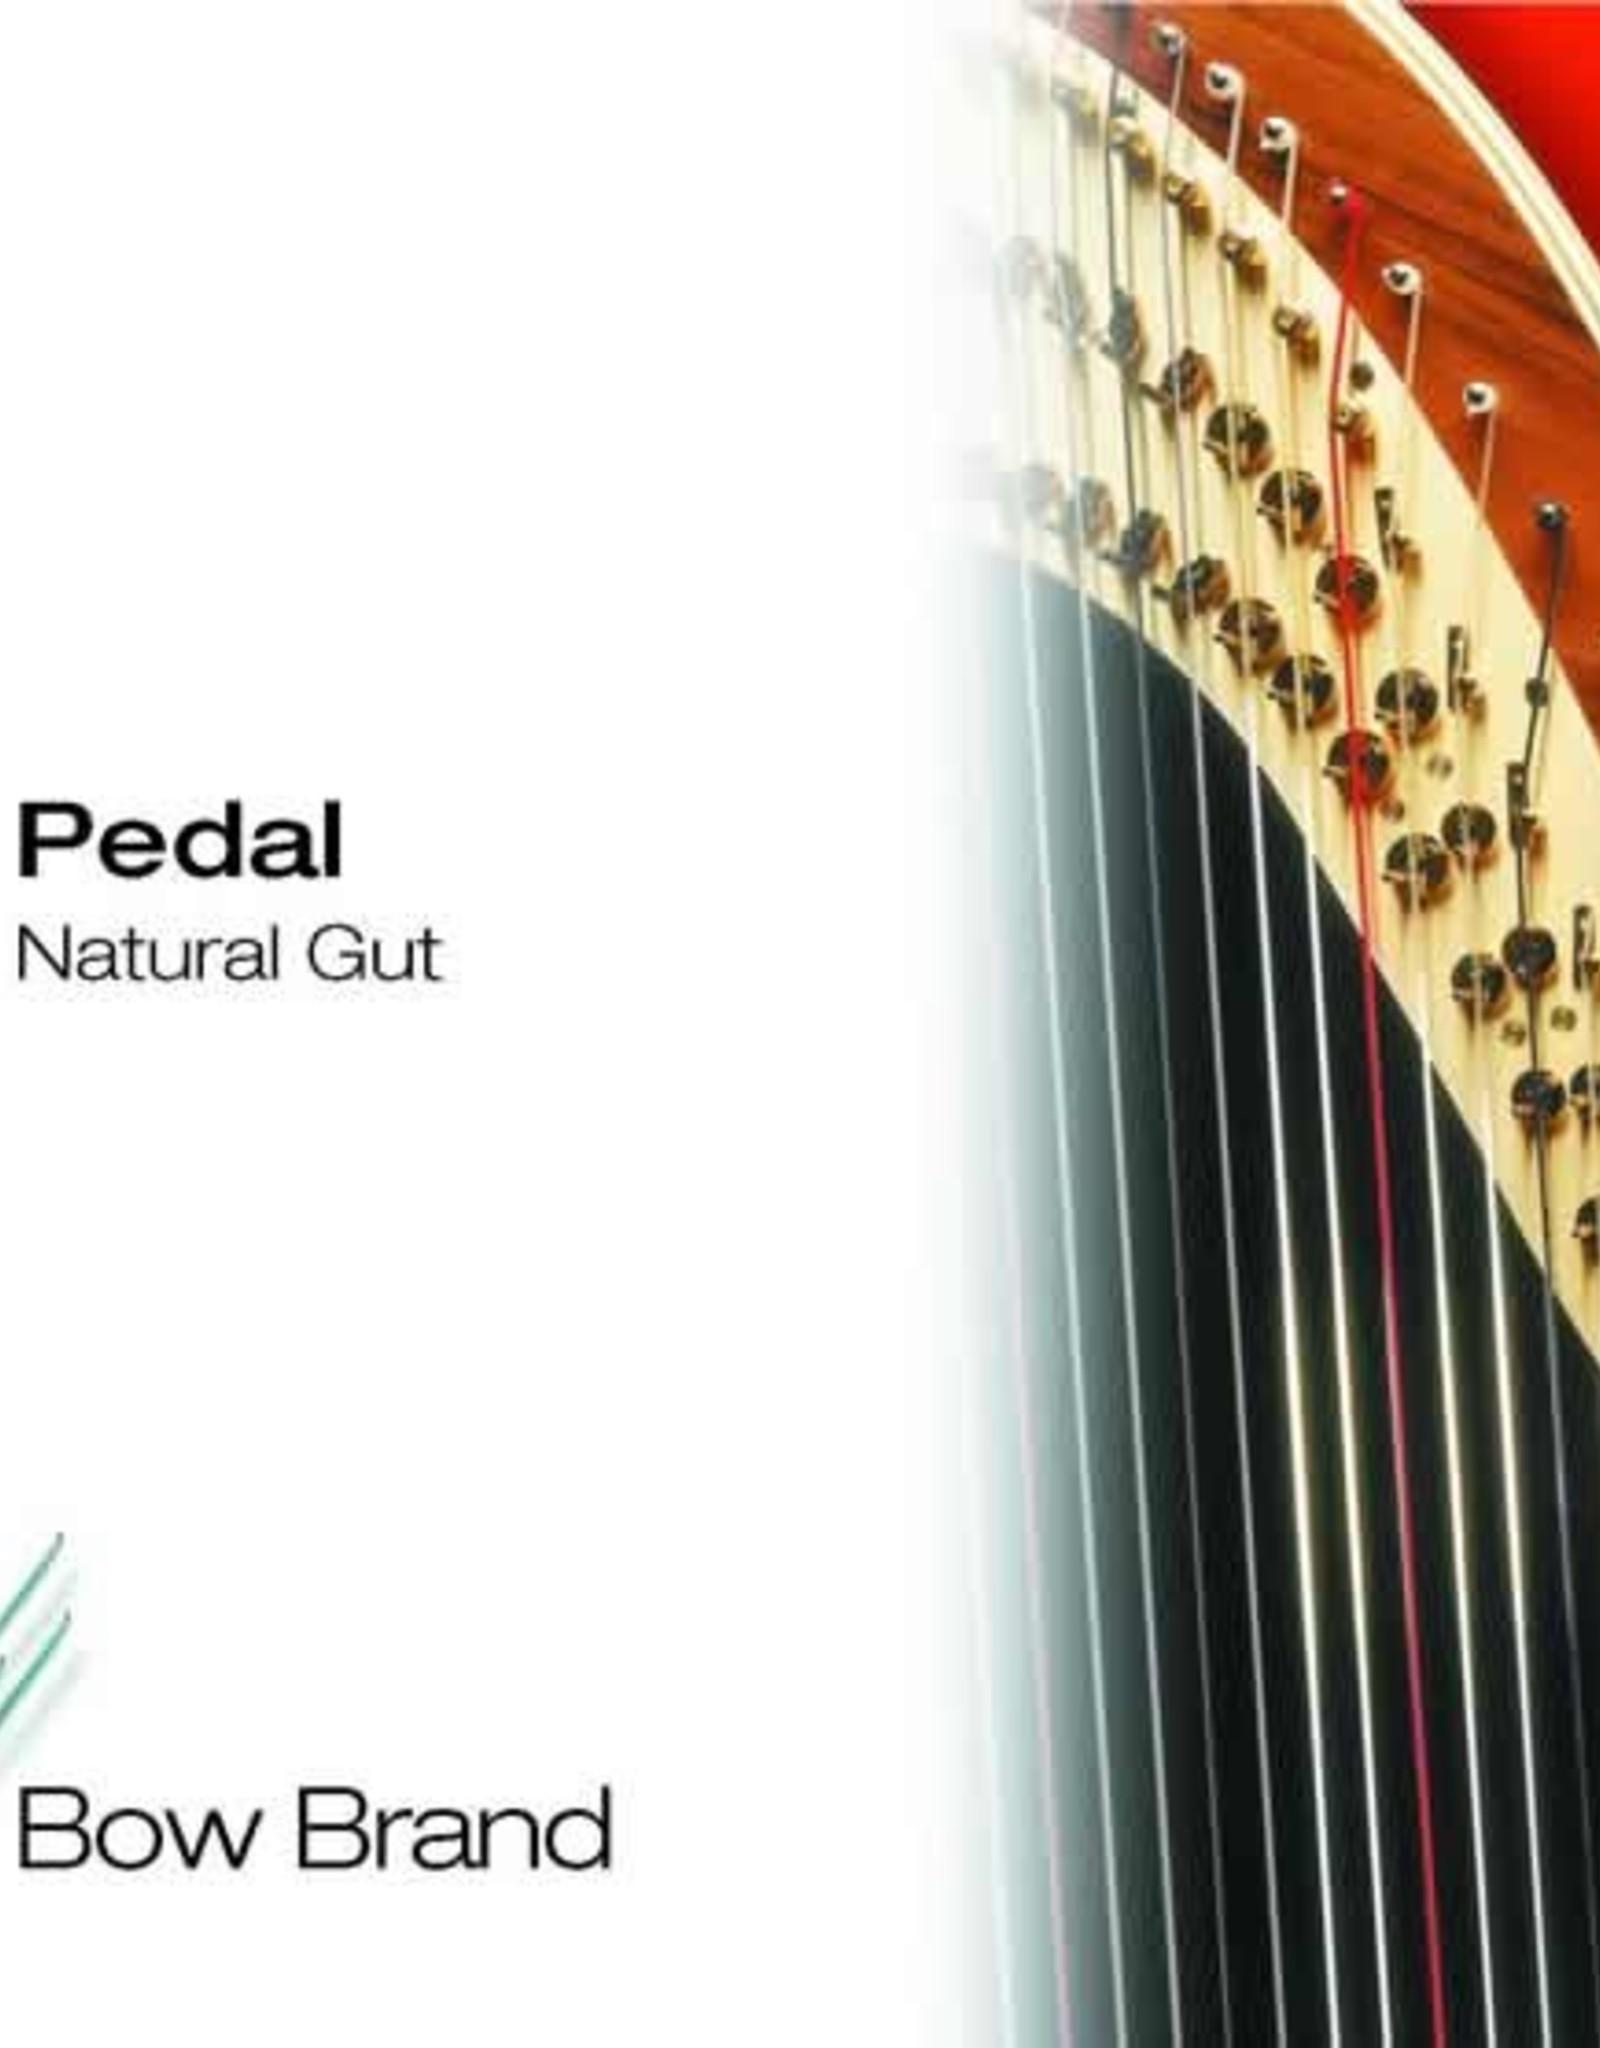 BOW BRAND  pedaal darm - pedal STD GUT 4/1 si